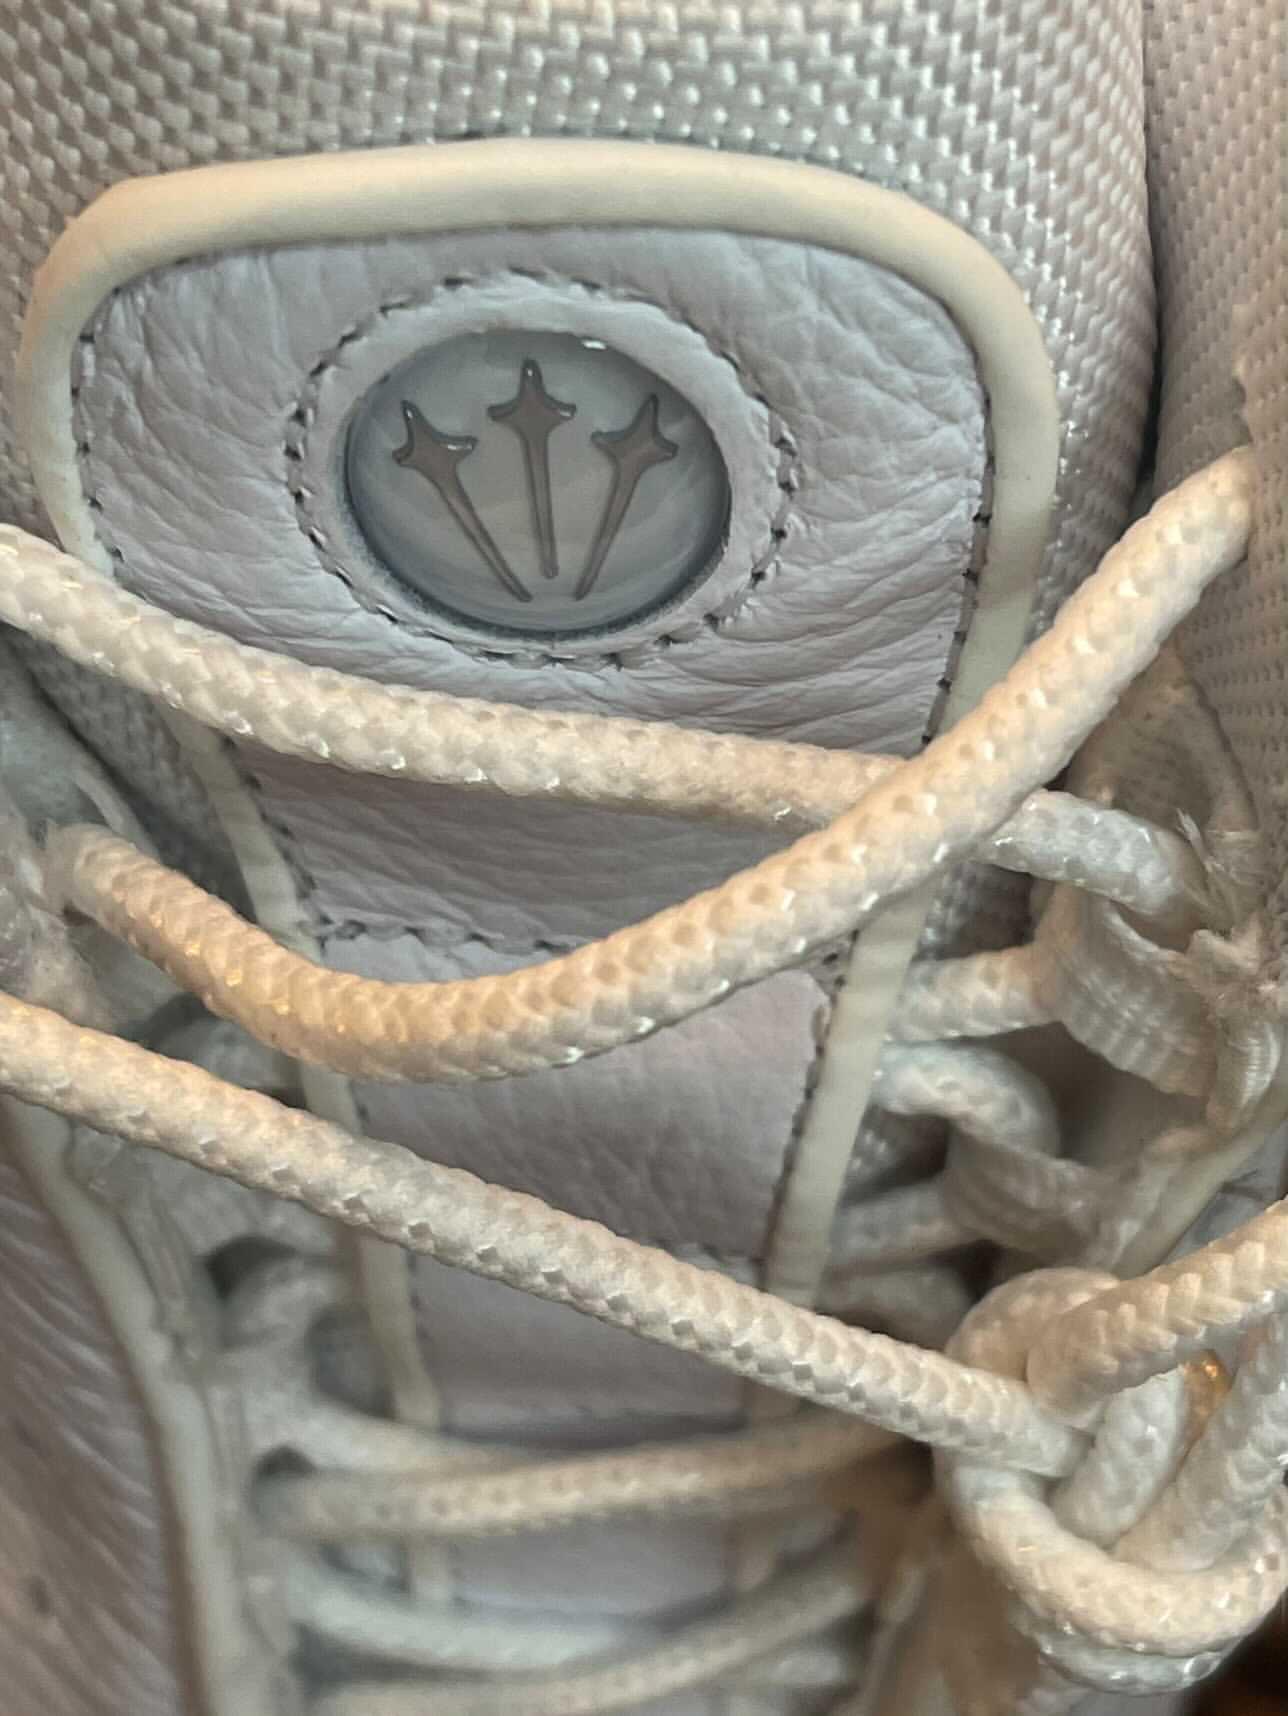 NOCTA,Nike,Hot Step Air Terra,  Drake x Nike 神秘新鞋终于曝光!复古小白鞋你喜欢吗?